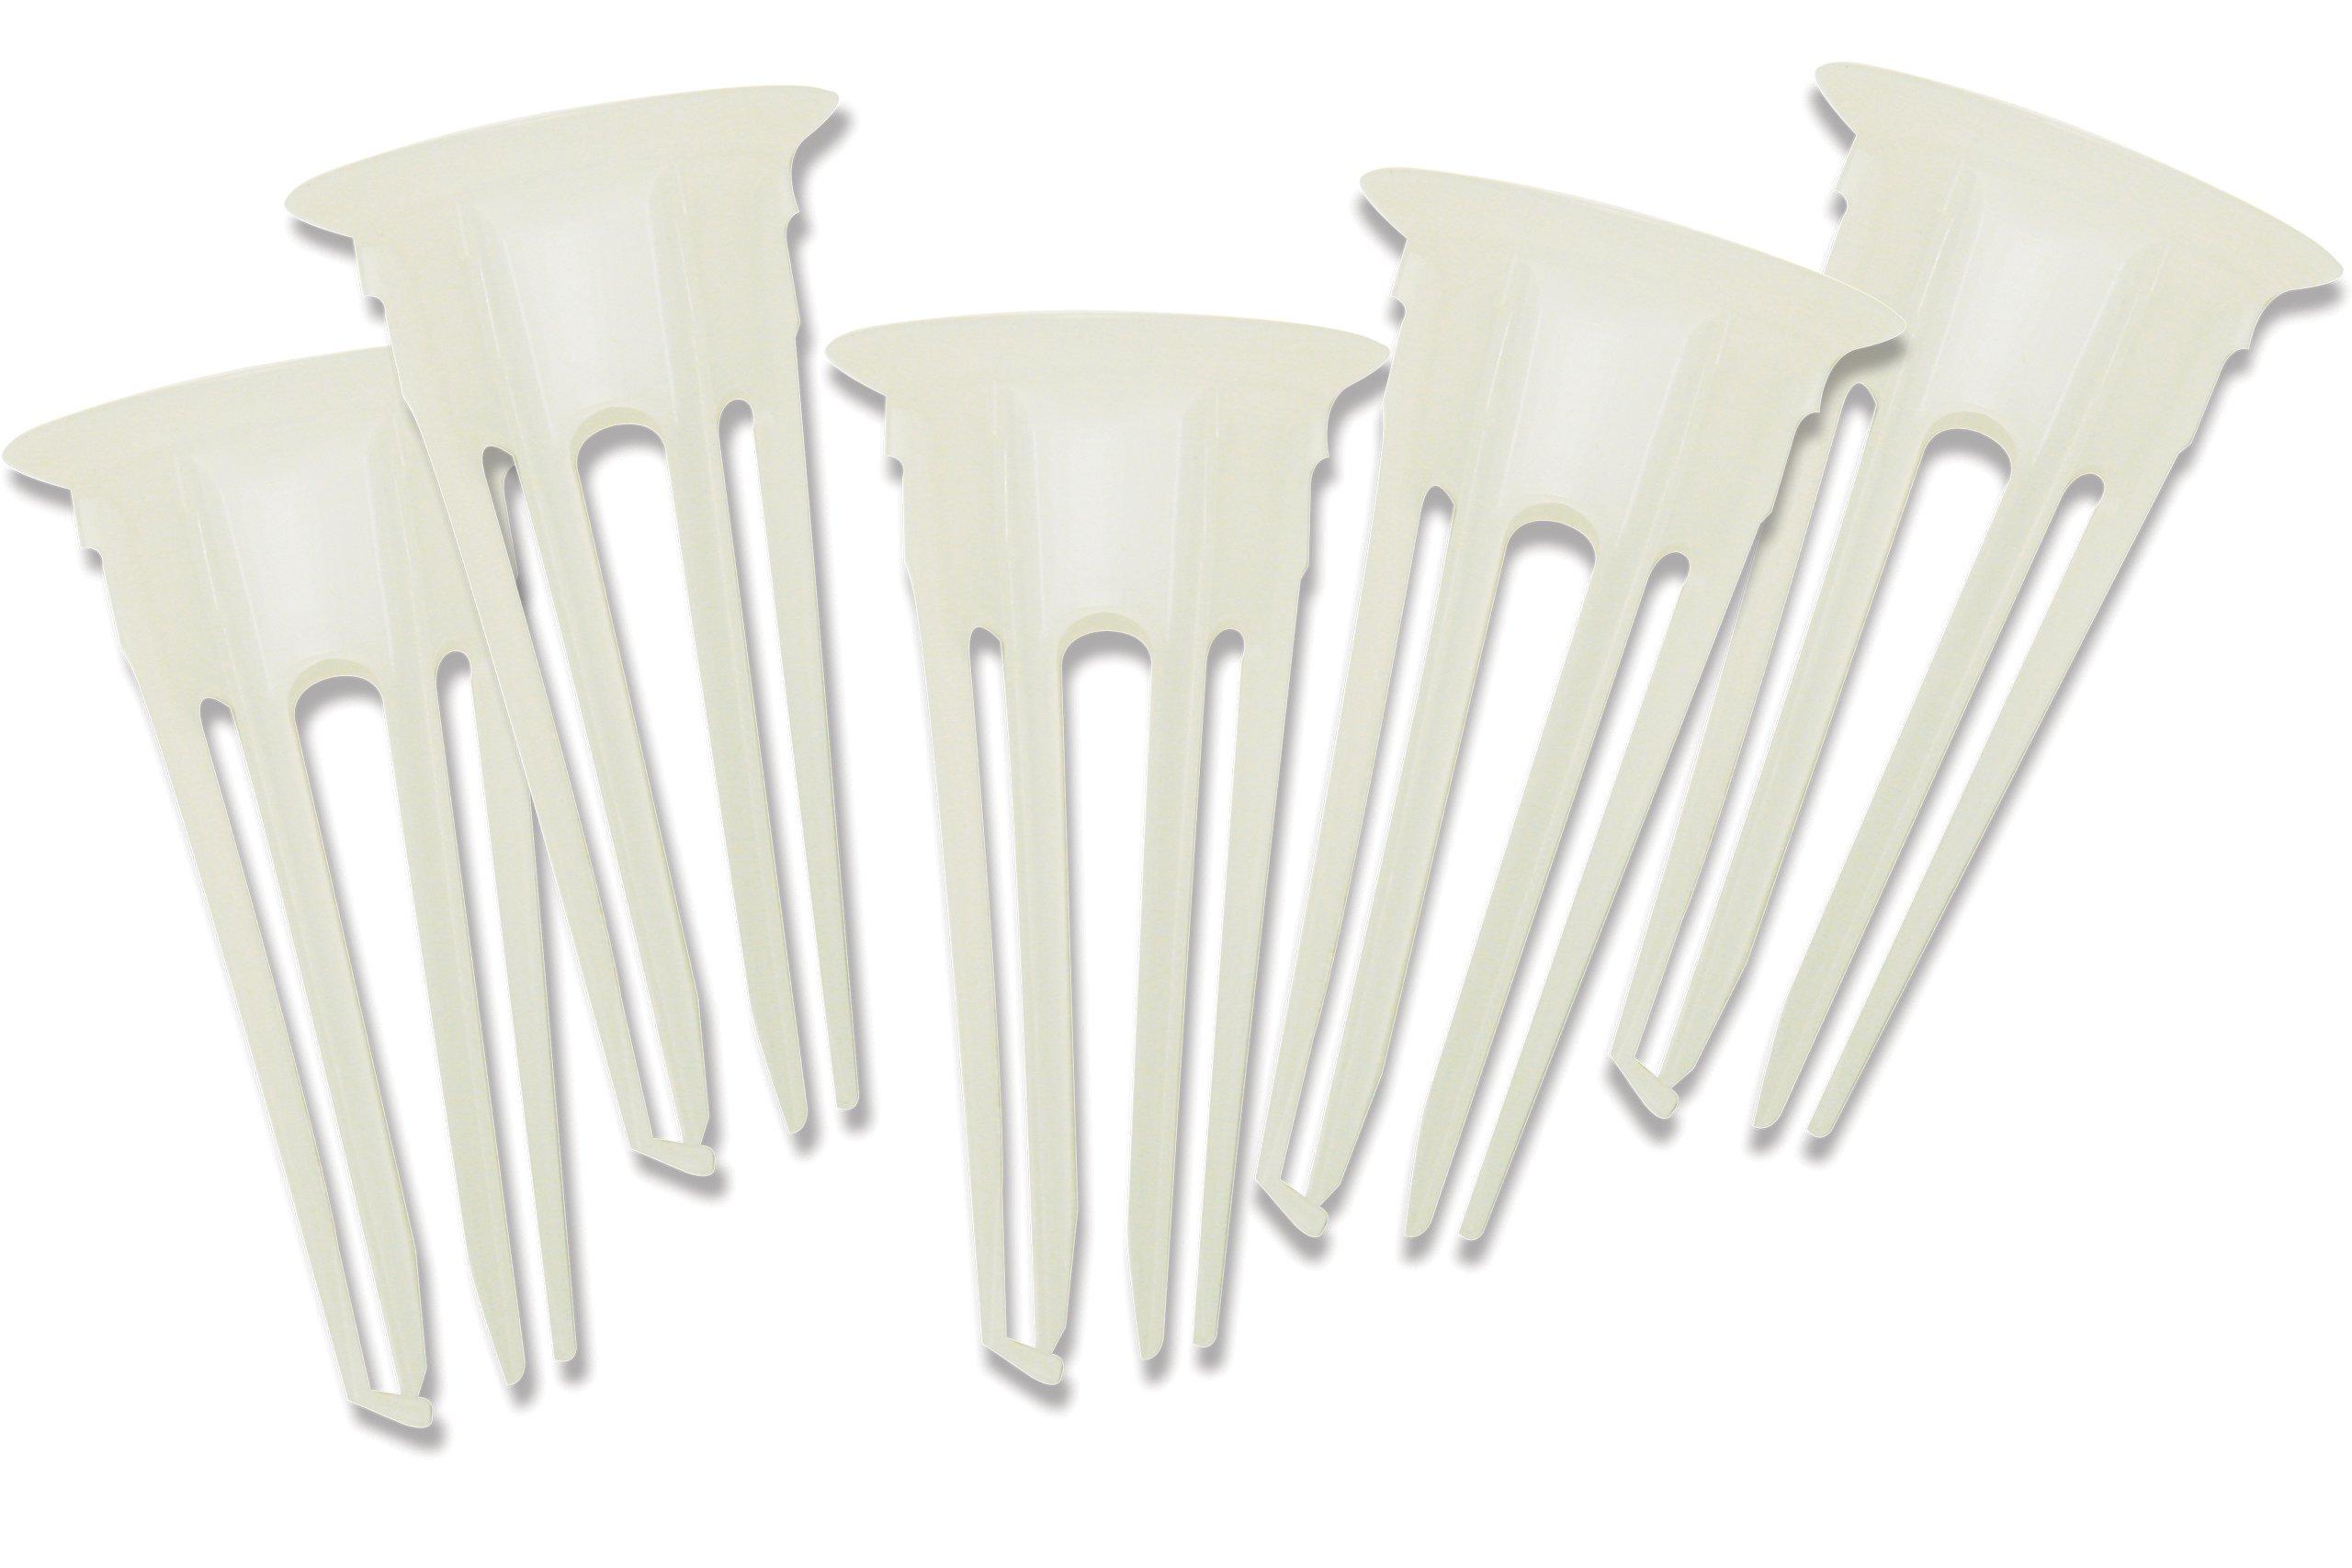 AeroGarden Grow Baskets (50-Pack) by AeroGrow